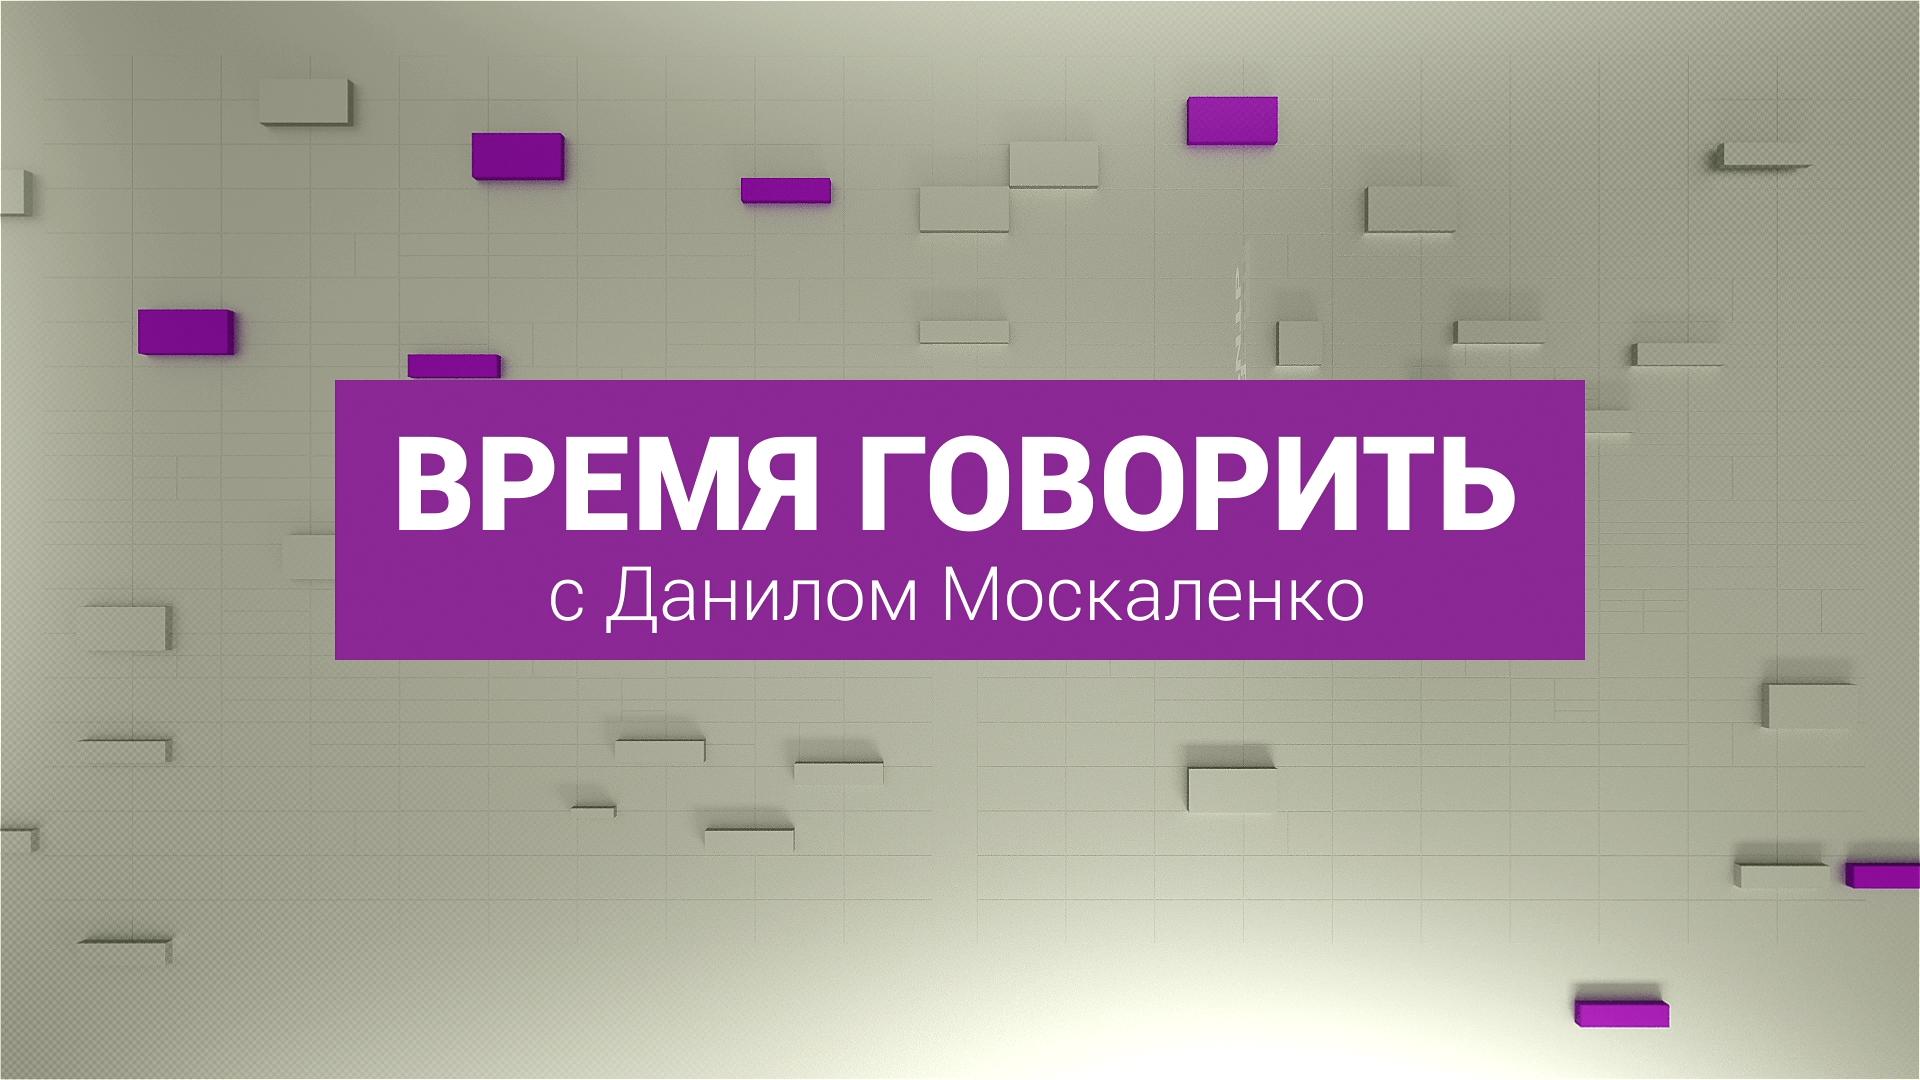 https://inbusiness.kz/ru/images/original/9/images/pZOFoTsg.png